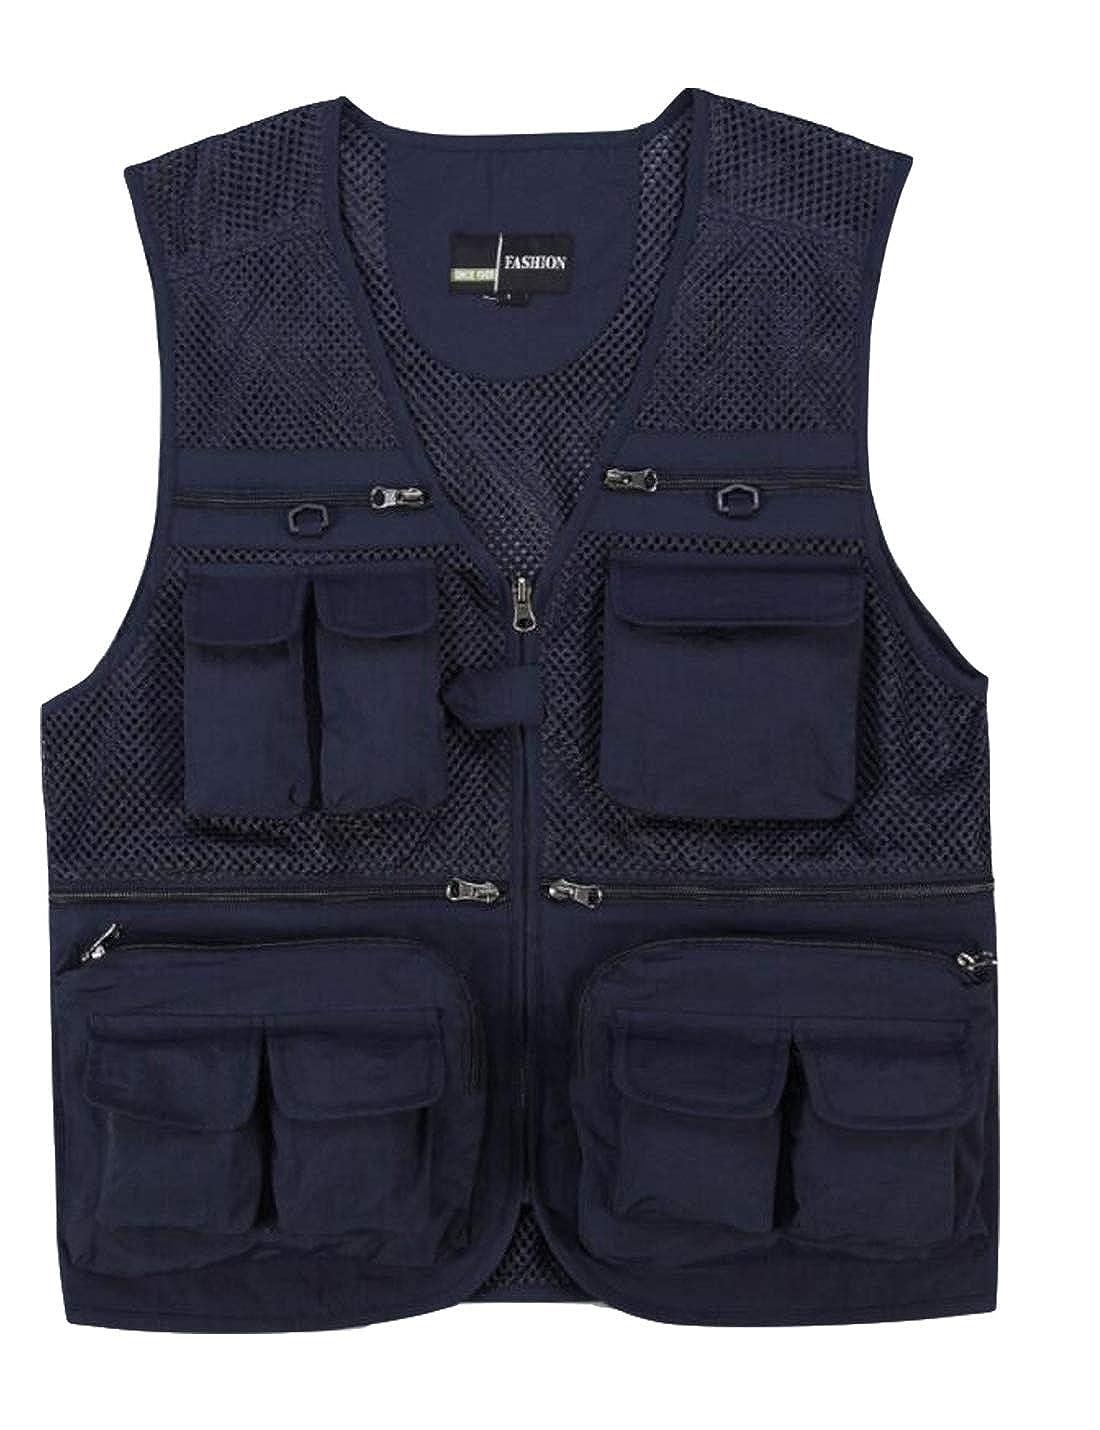 Yimoon Mens Multi-Pocket Professional Photography Vest Camera Vest Director Reporter Mesh Vest